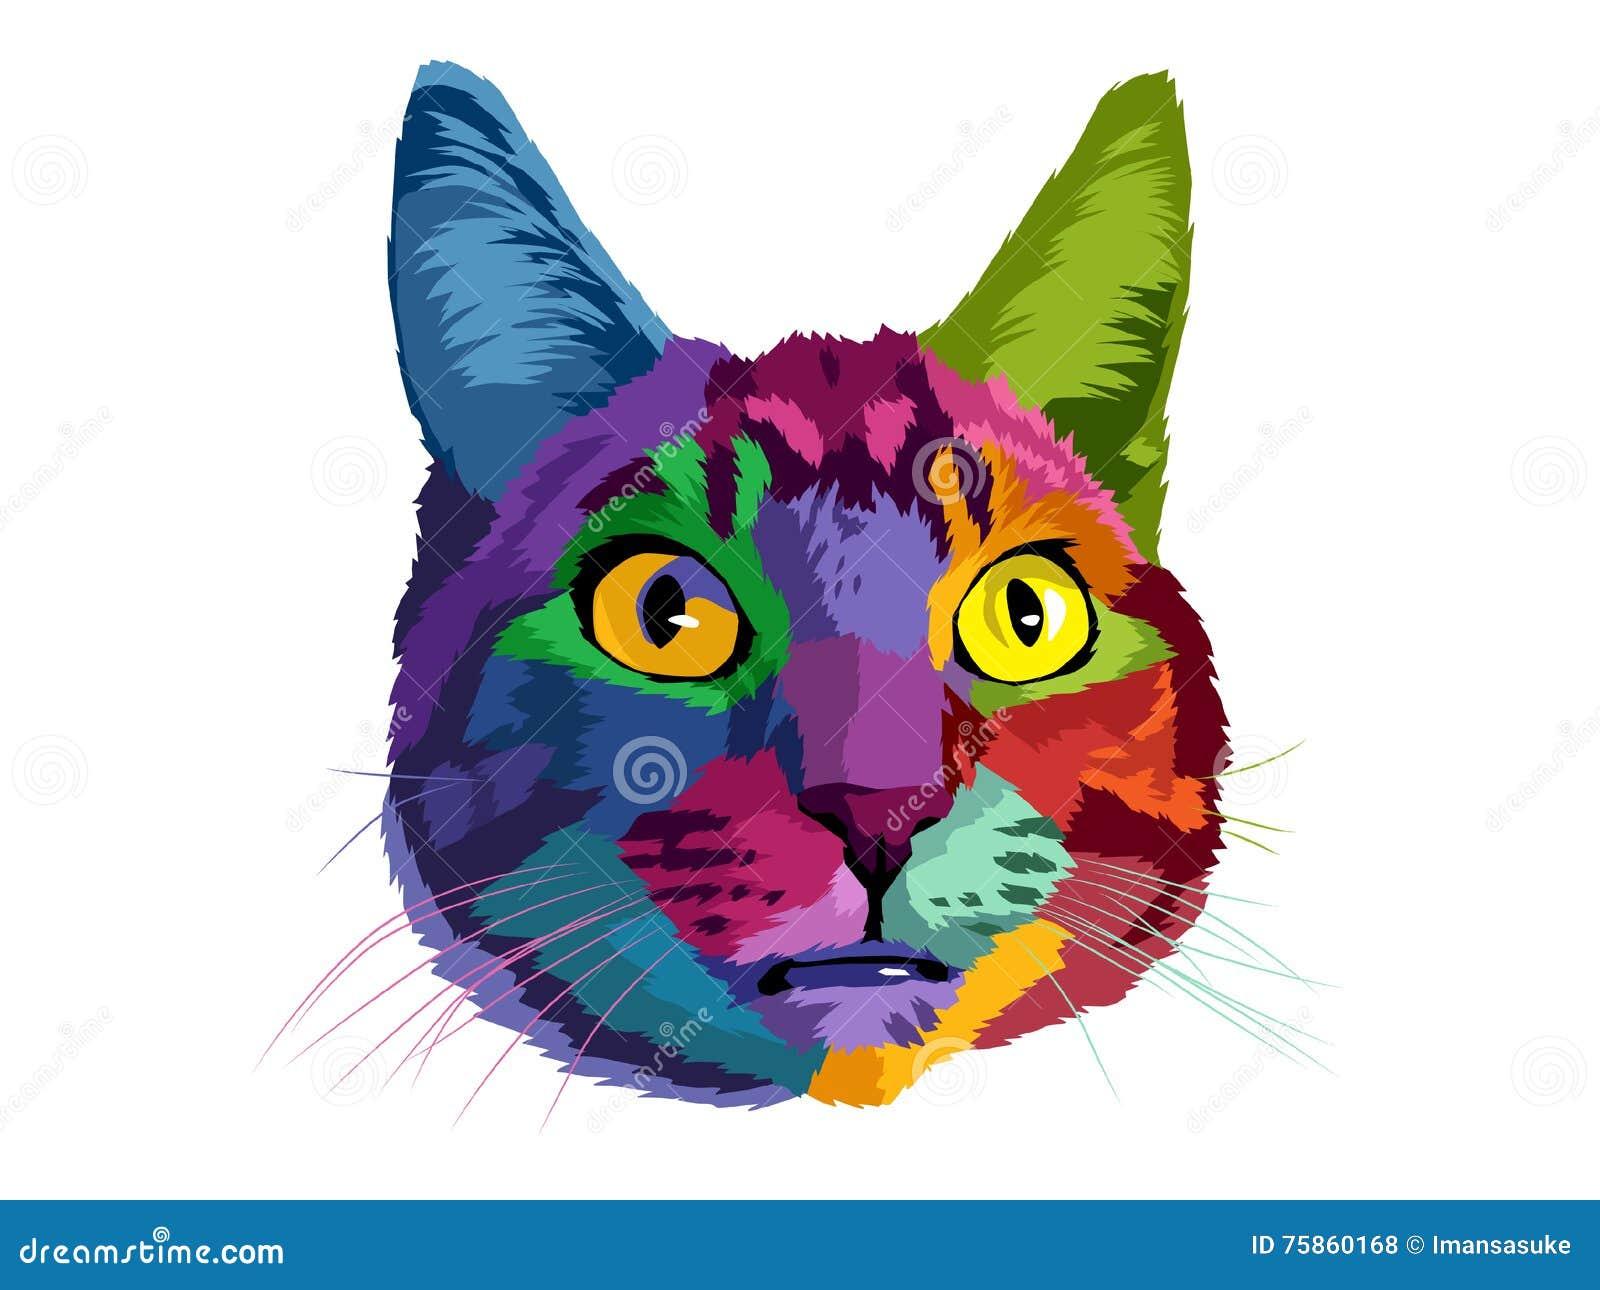 cat pop art stock illustration illustration of show 75860168